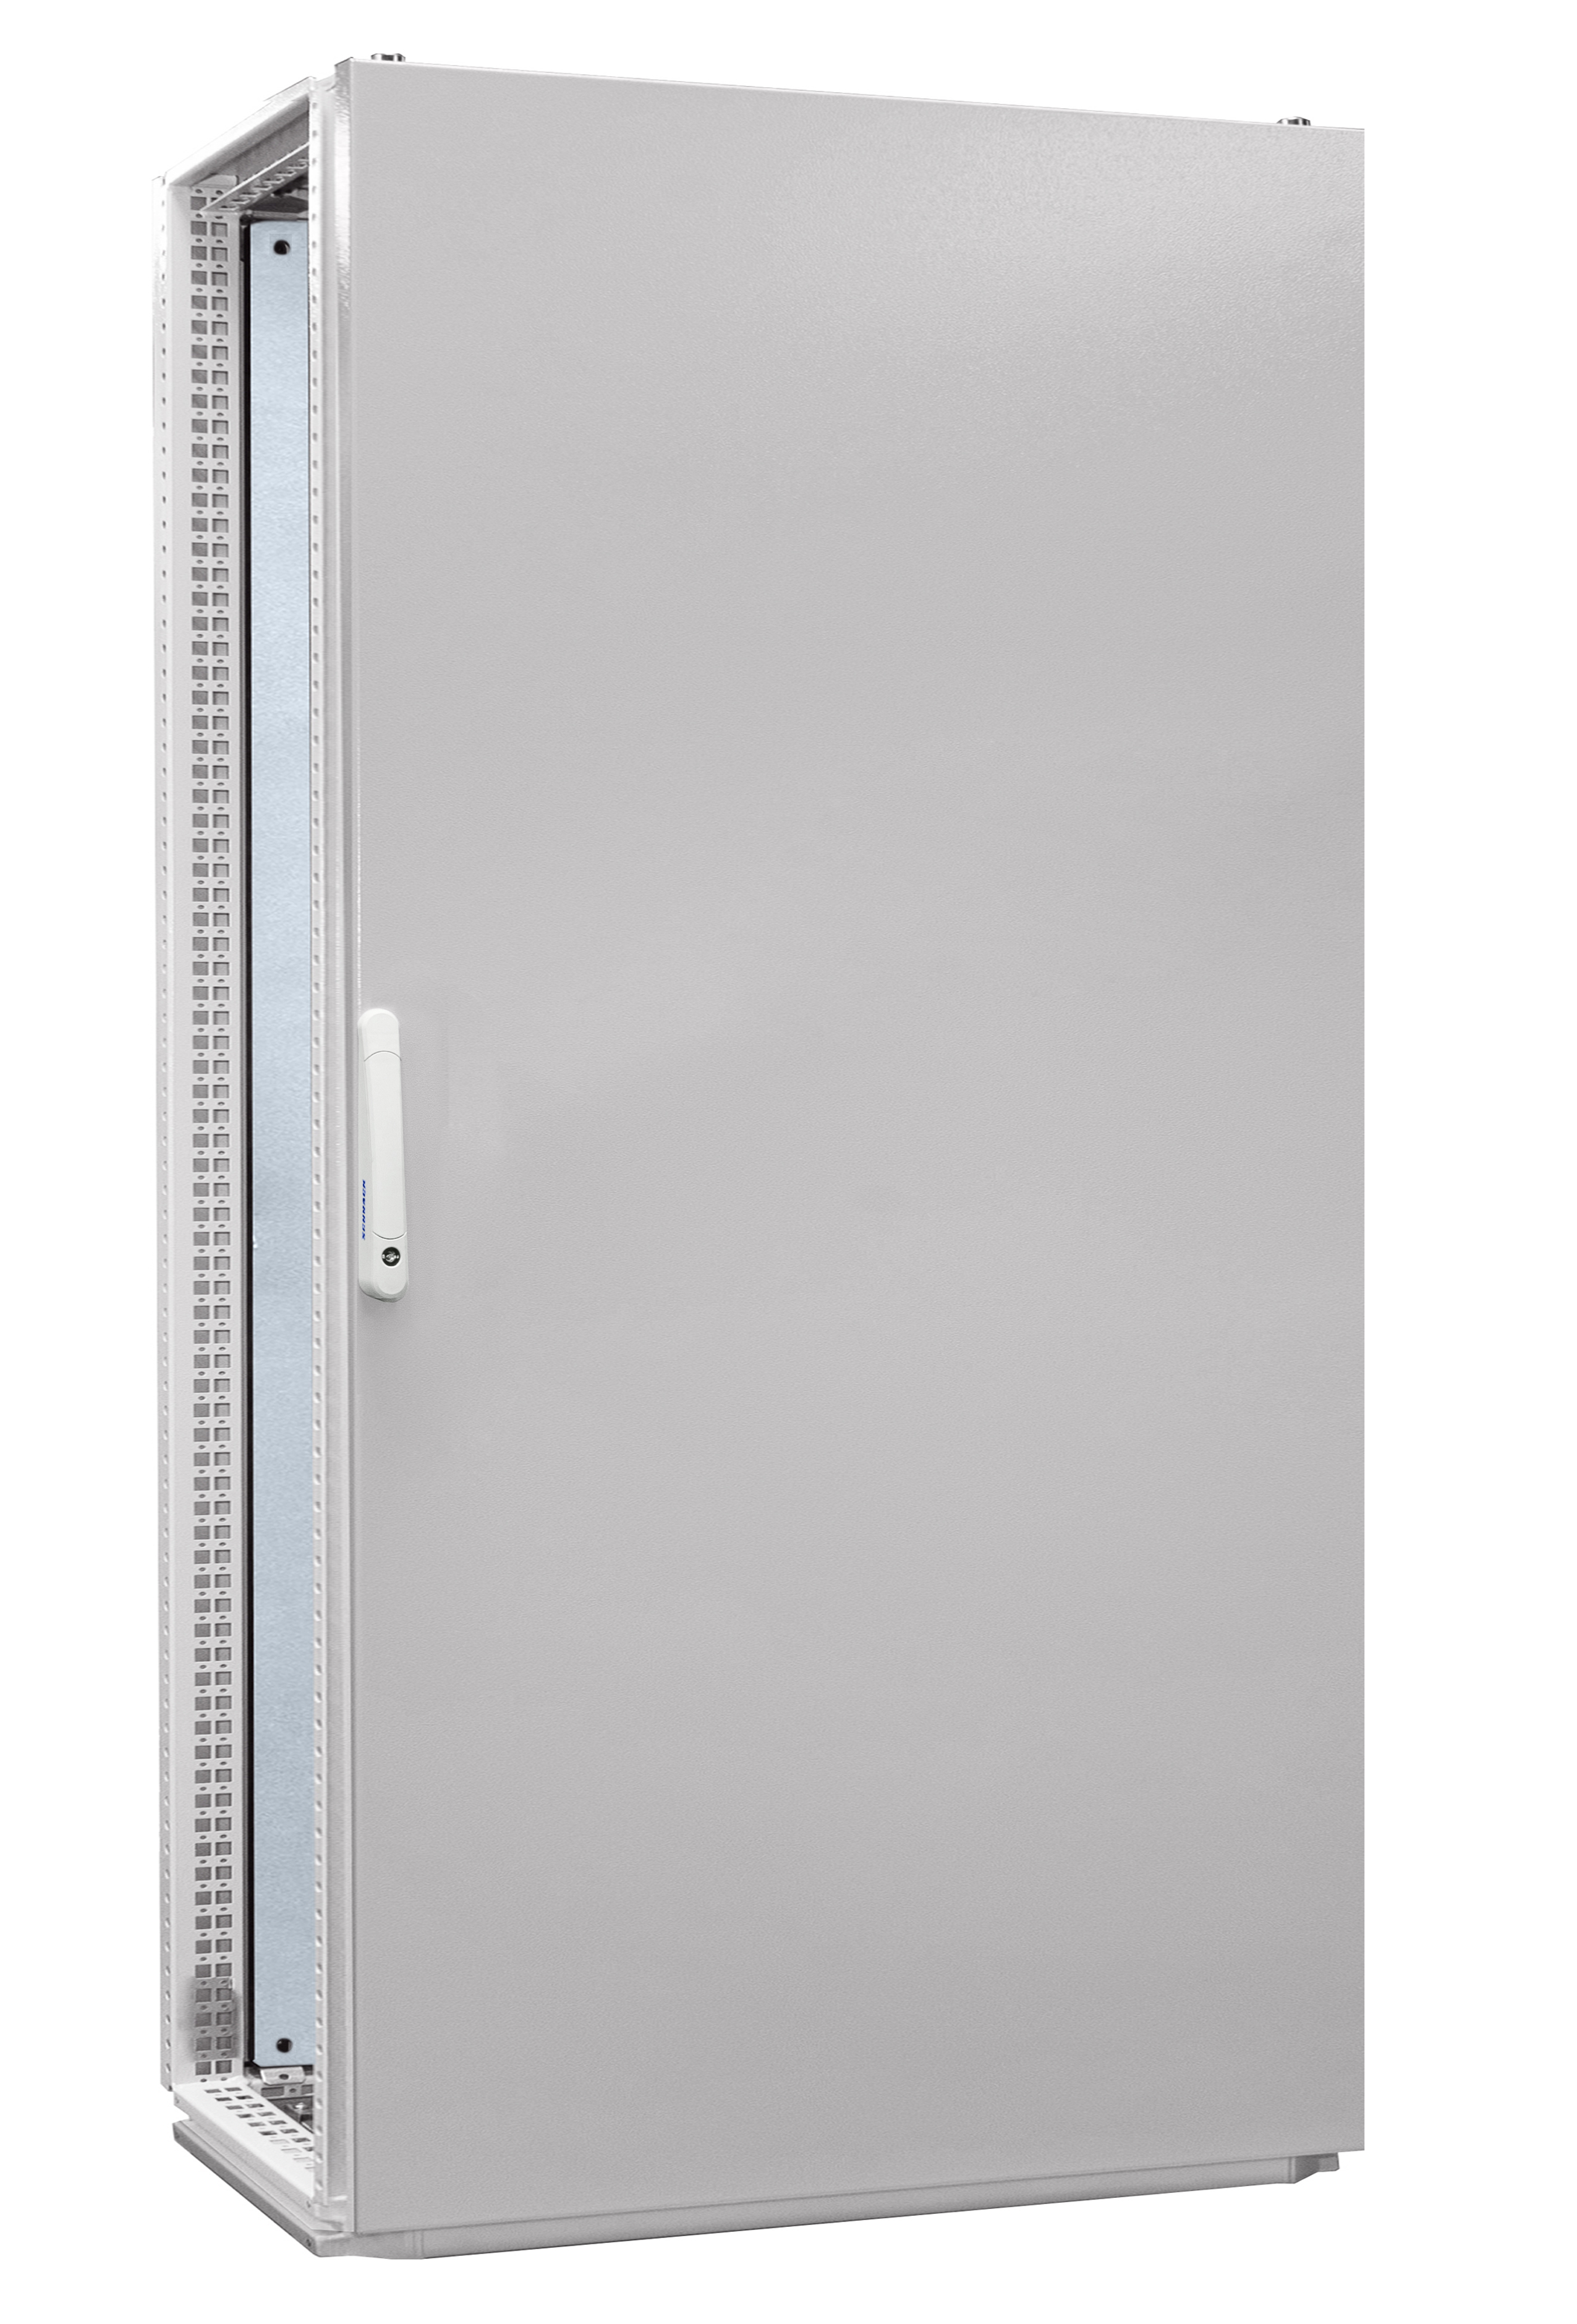 1 Stk Anreihschrank 1-Tür IP55 H=2000 B=1000 T=600mm Stahlblech AC201060--